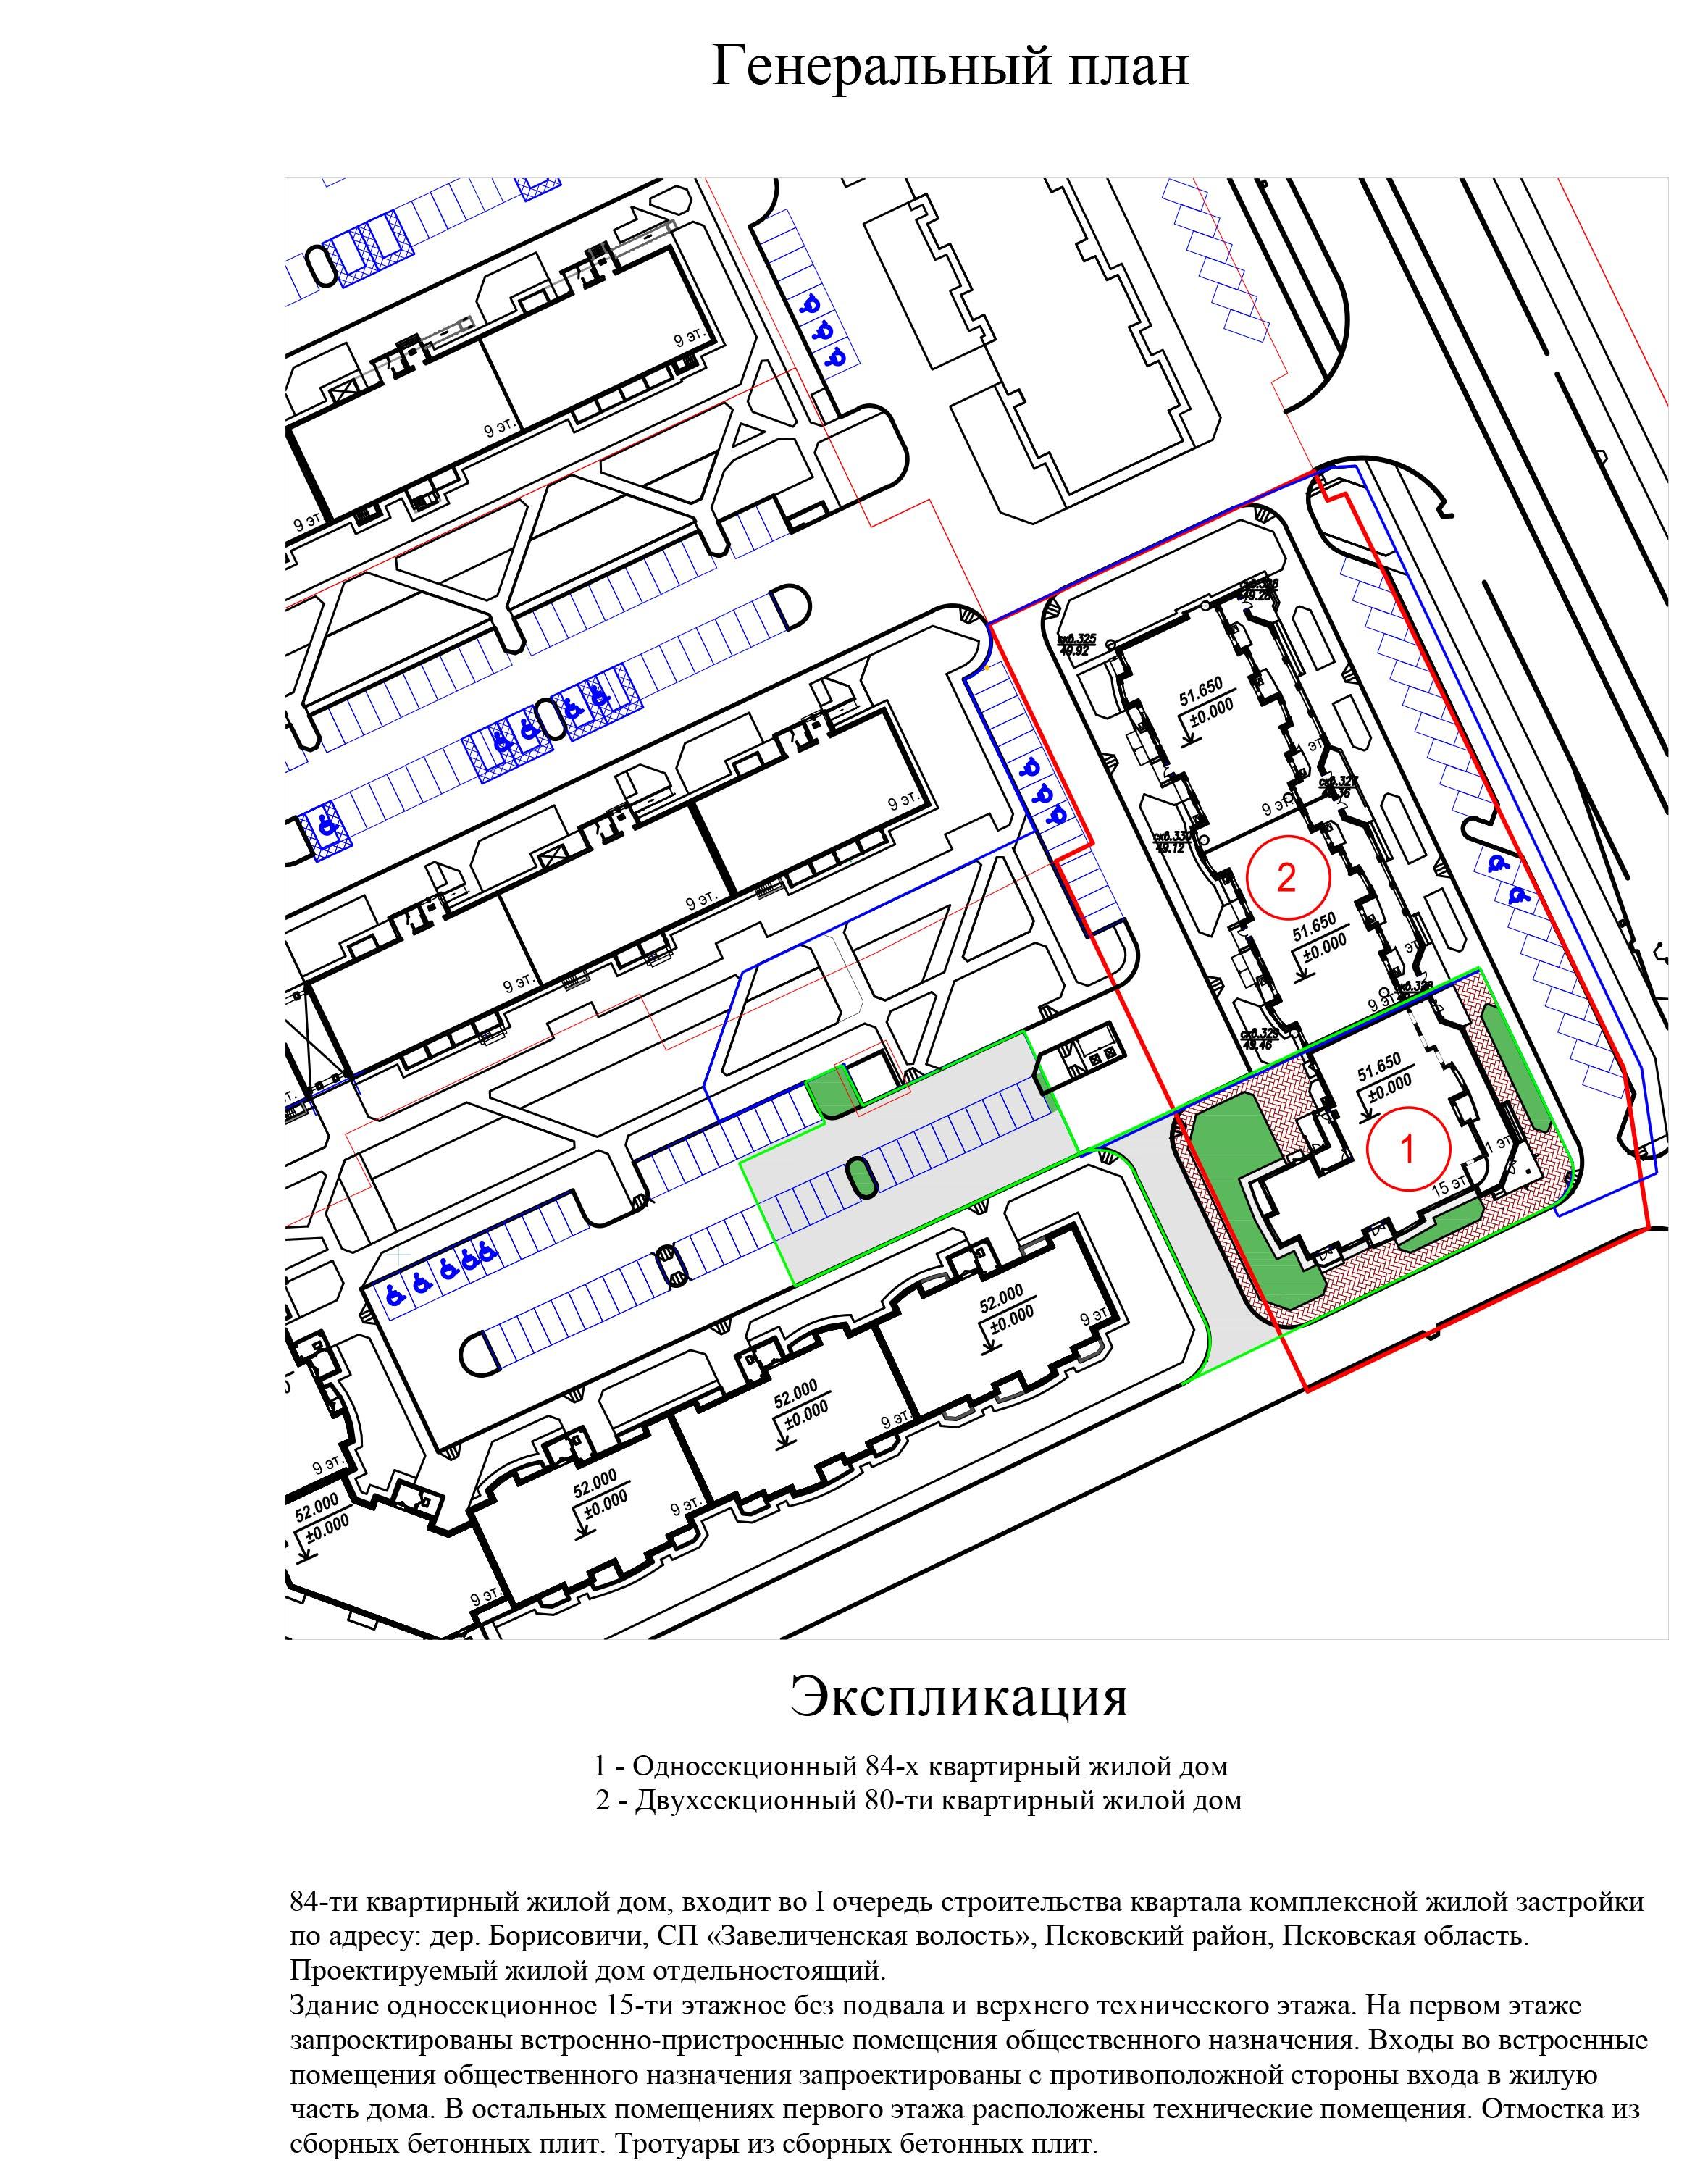 Двухкомнатная квартира - ул.Балтийская, д. 1а, кв. 44, 50, 56, 62, 68, 74, 80